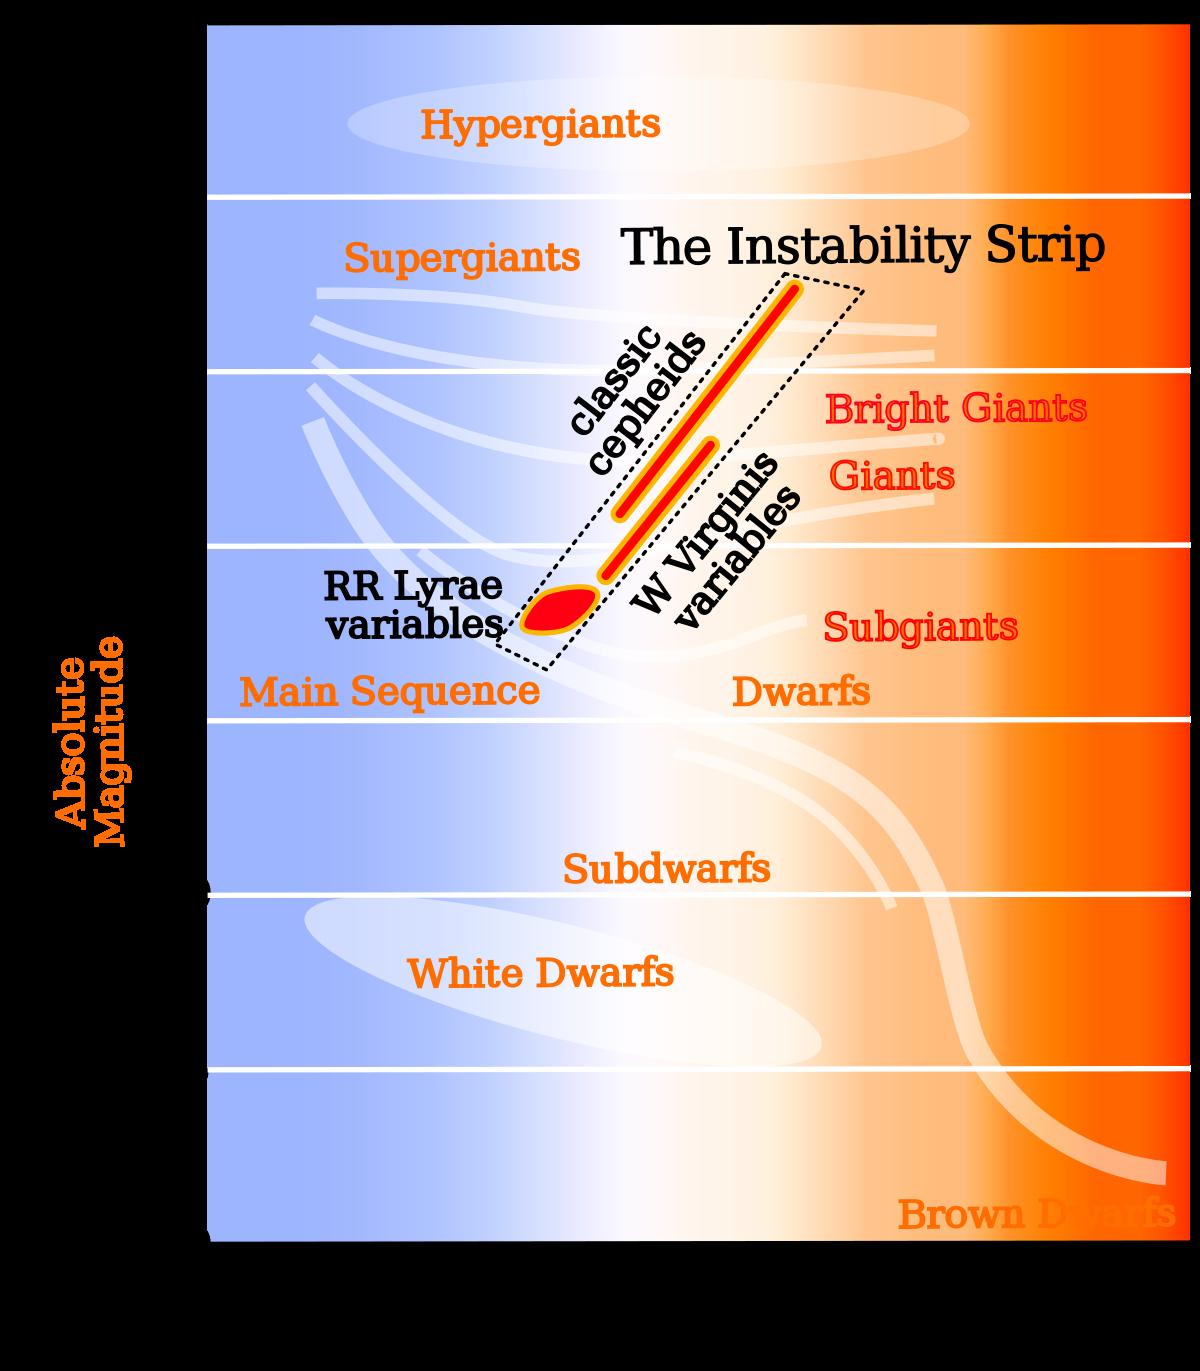 Hr Diagram Definition Instability Strip Wikipedia